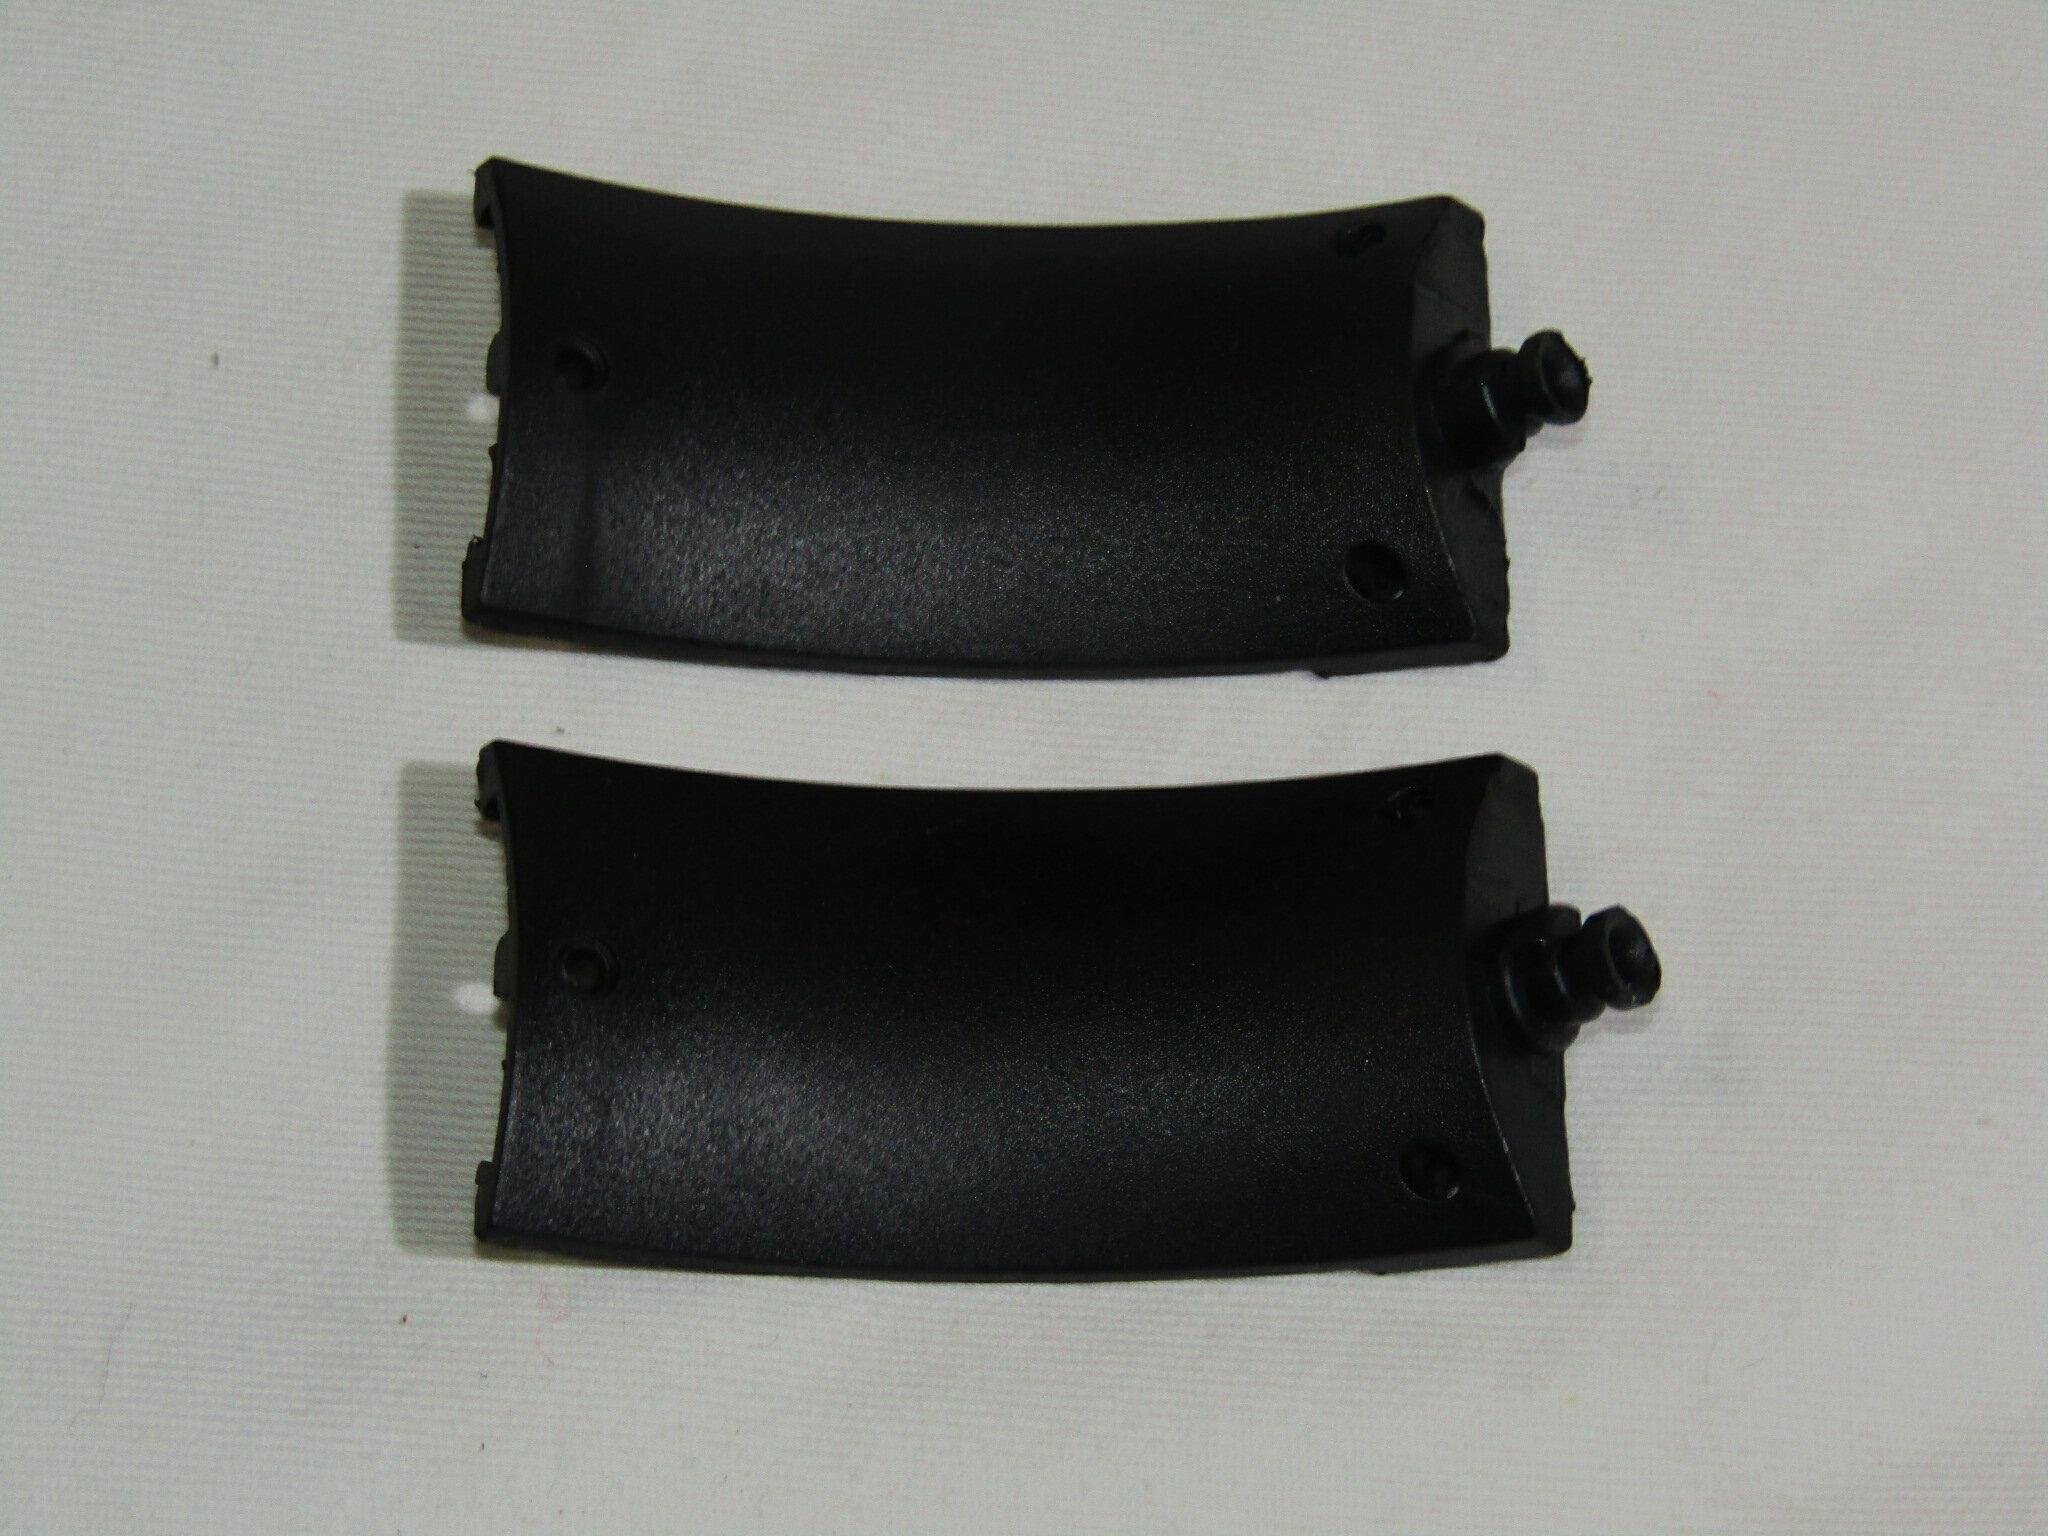 Pg 5 - Crayola Cell Phones & Accessories | Rakuten com